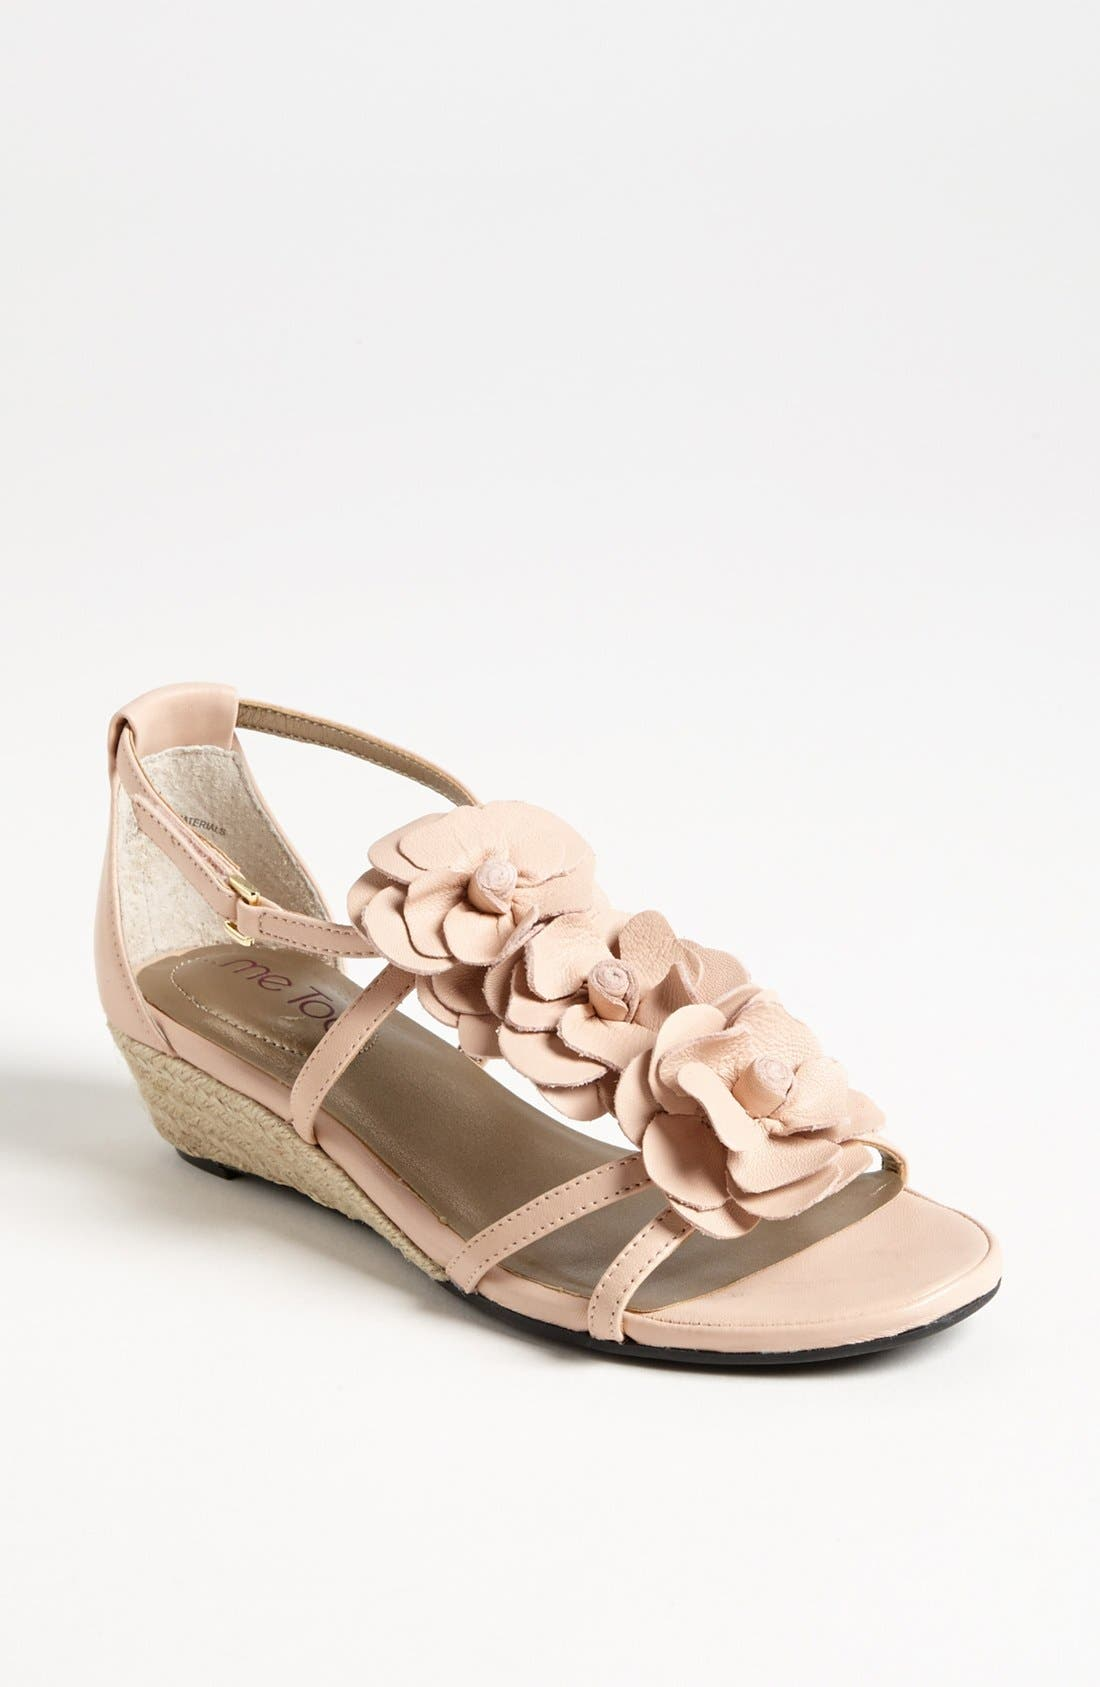 Alternate Image 1 Selected - Me Too 'Simona' Wedge Sandal